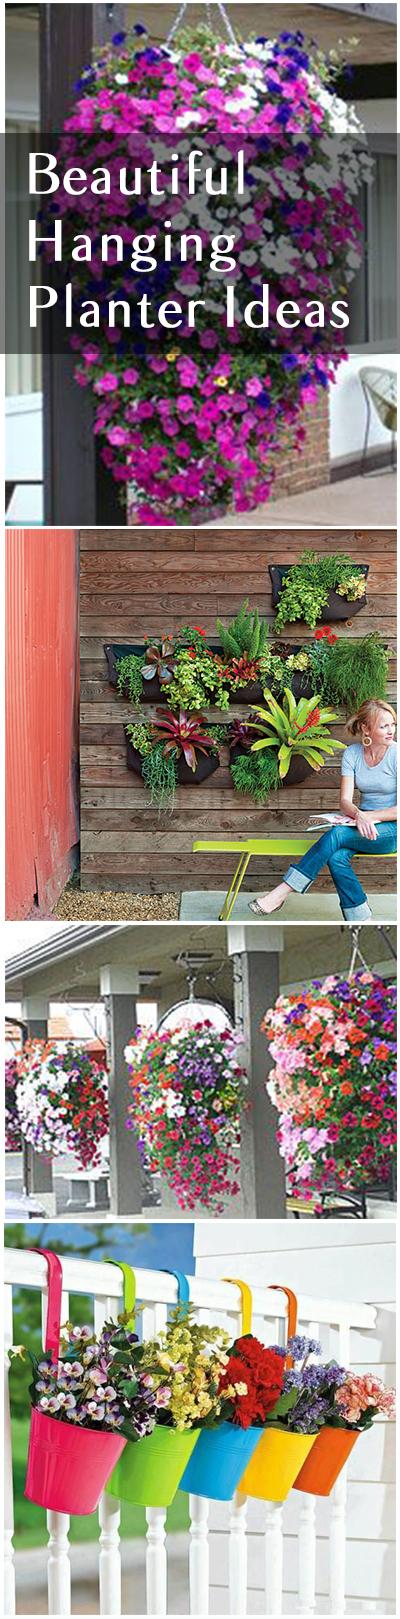 Gardening, home garden, garden hacks, garden tips and tricks, growing plants, gardening DIYs, gardening crafts, popular pin, hanging planter ideas, outdoor planter